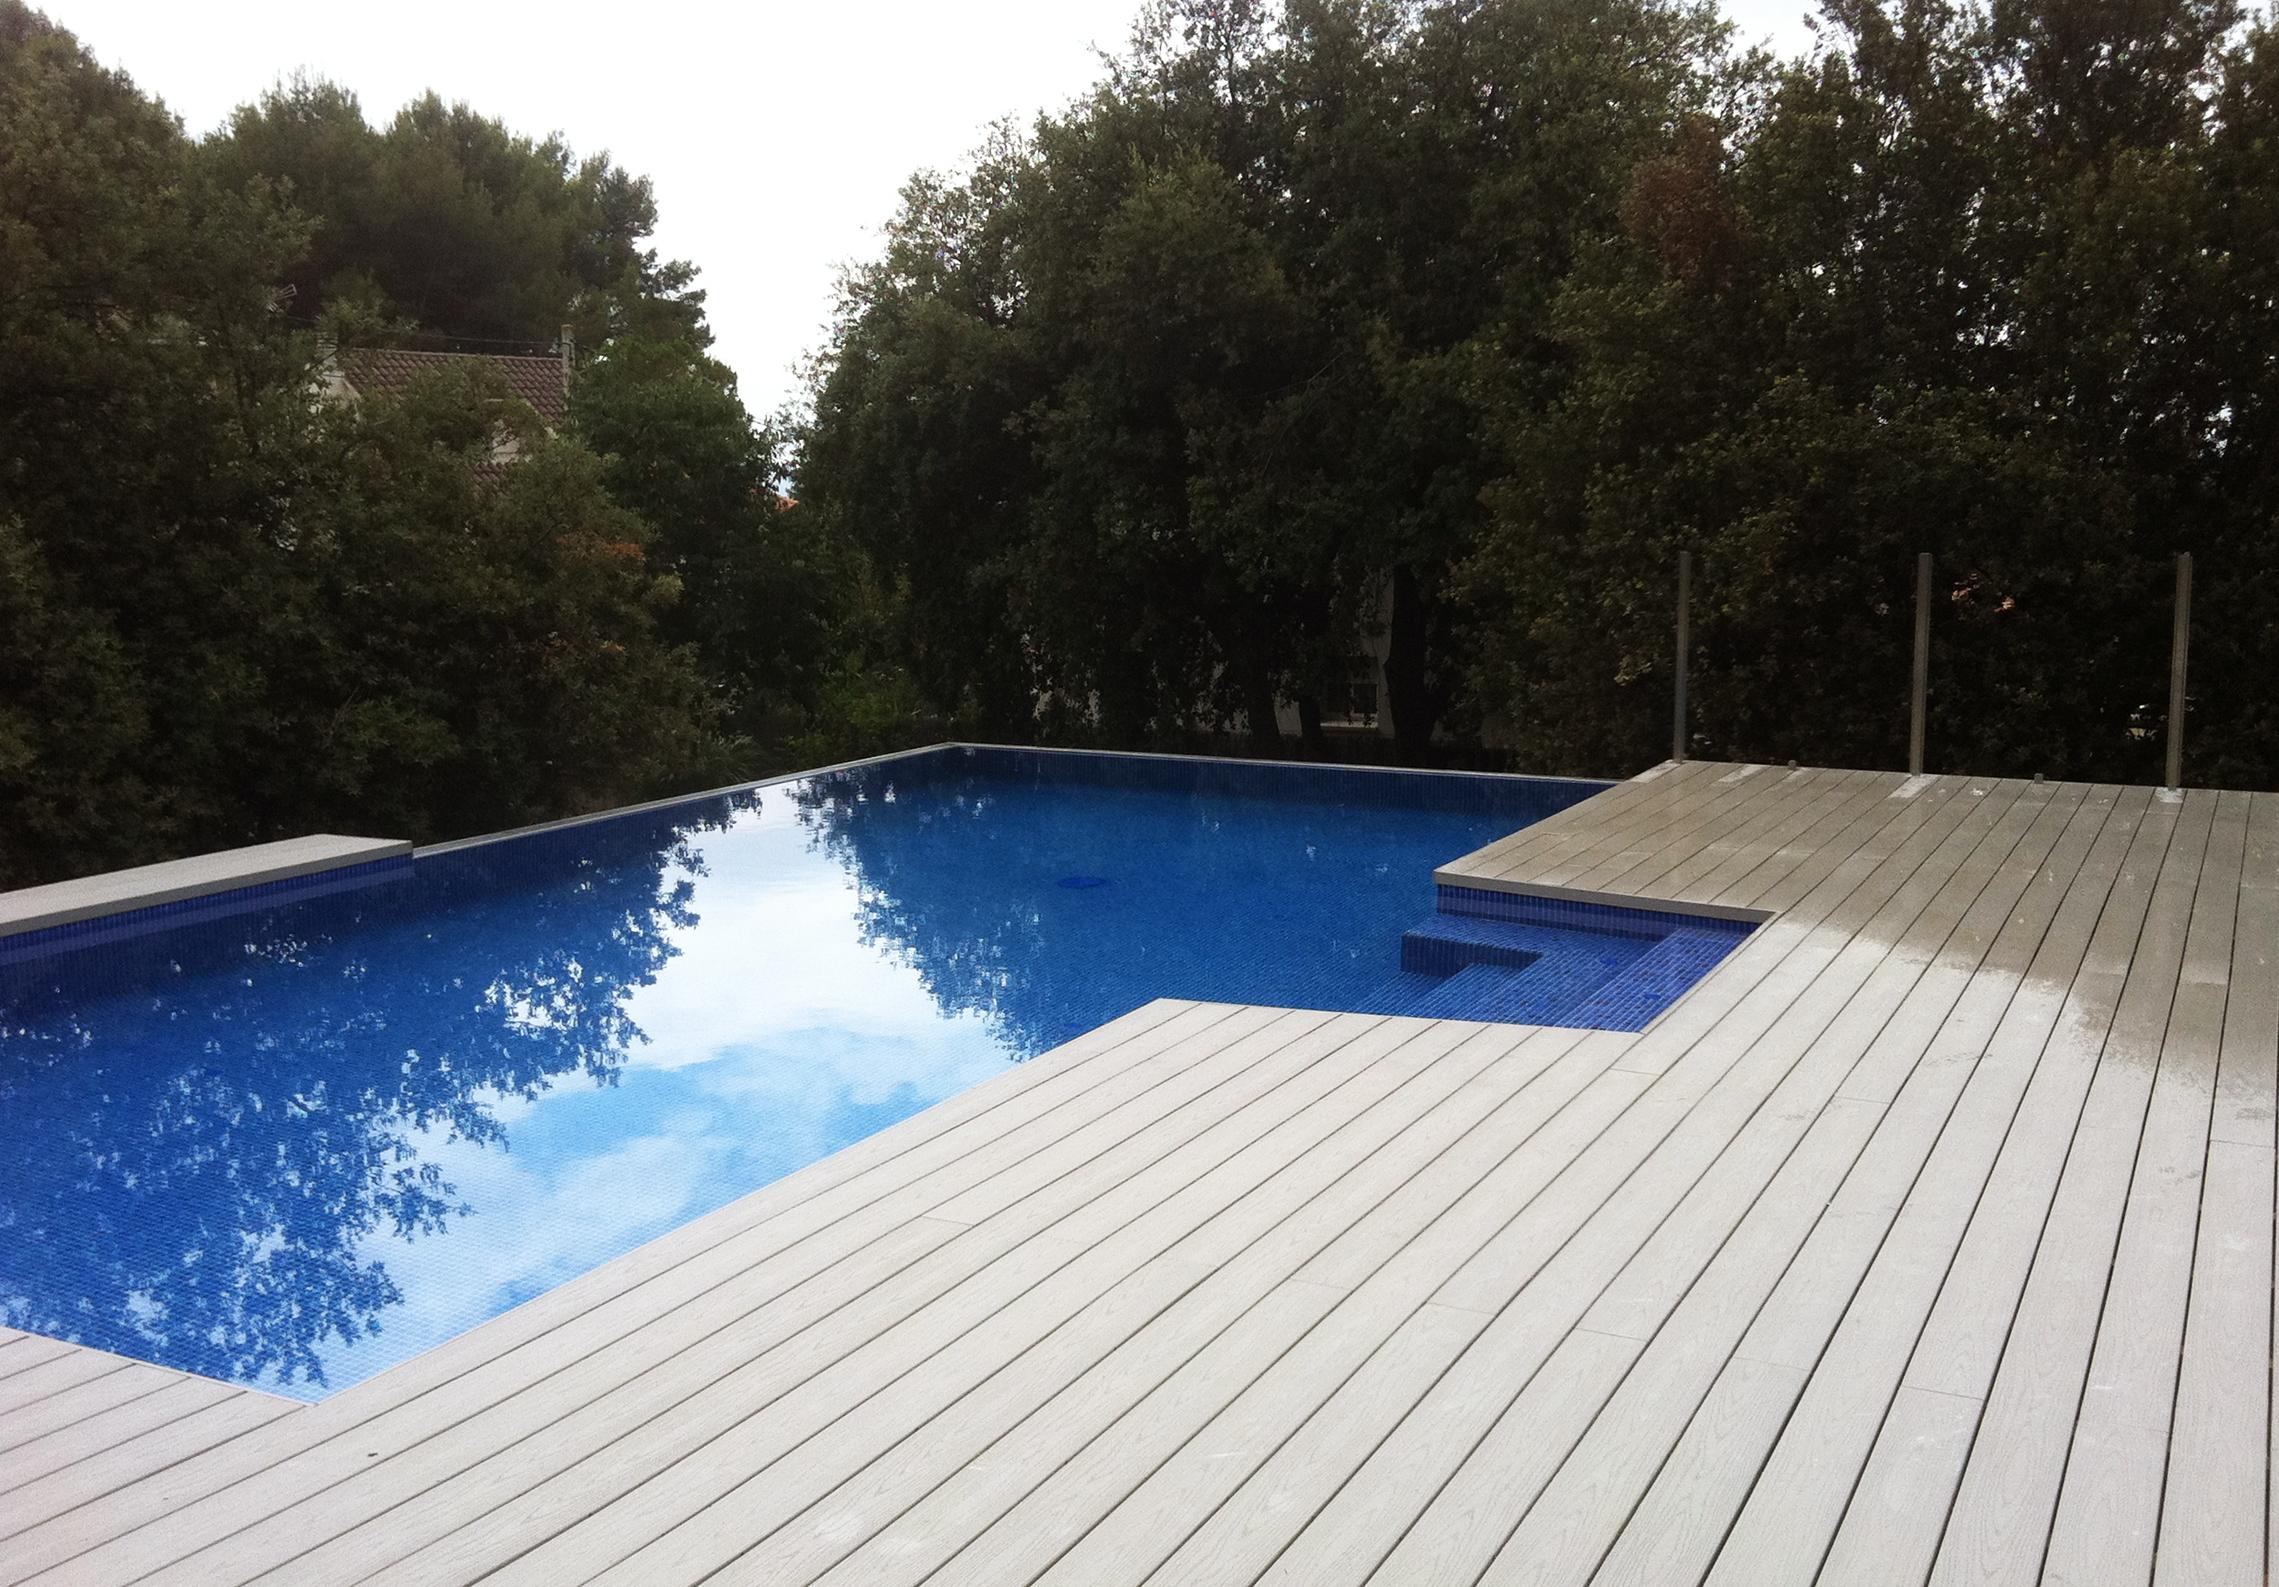 interexter-proyectos-reformas-decoracion-tarima-piscina.jpg